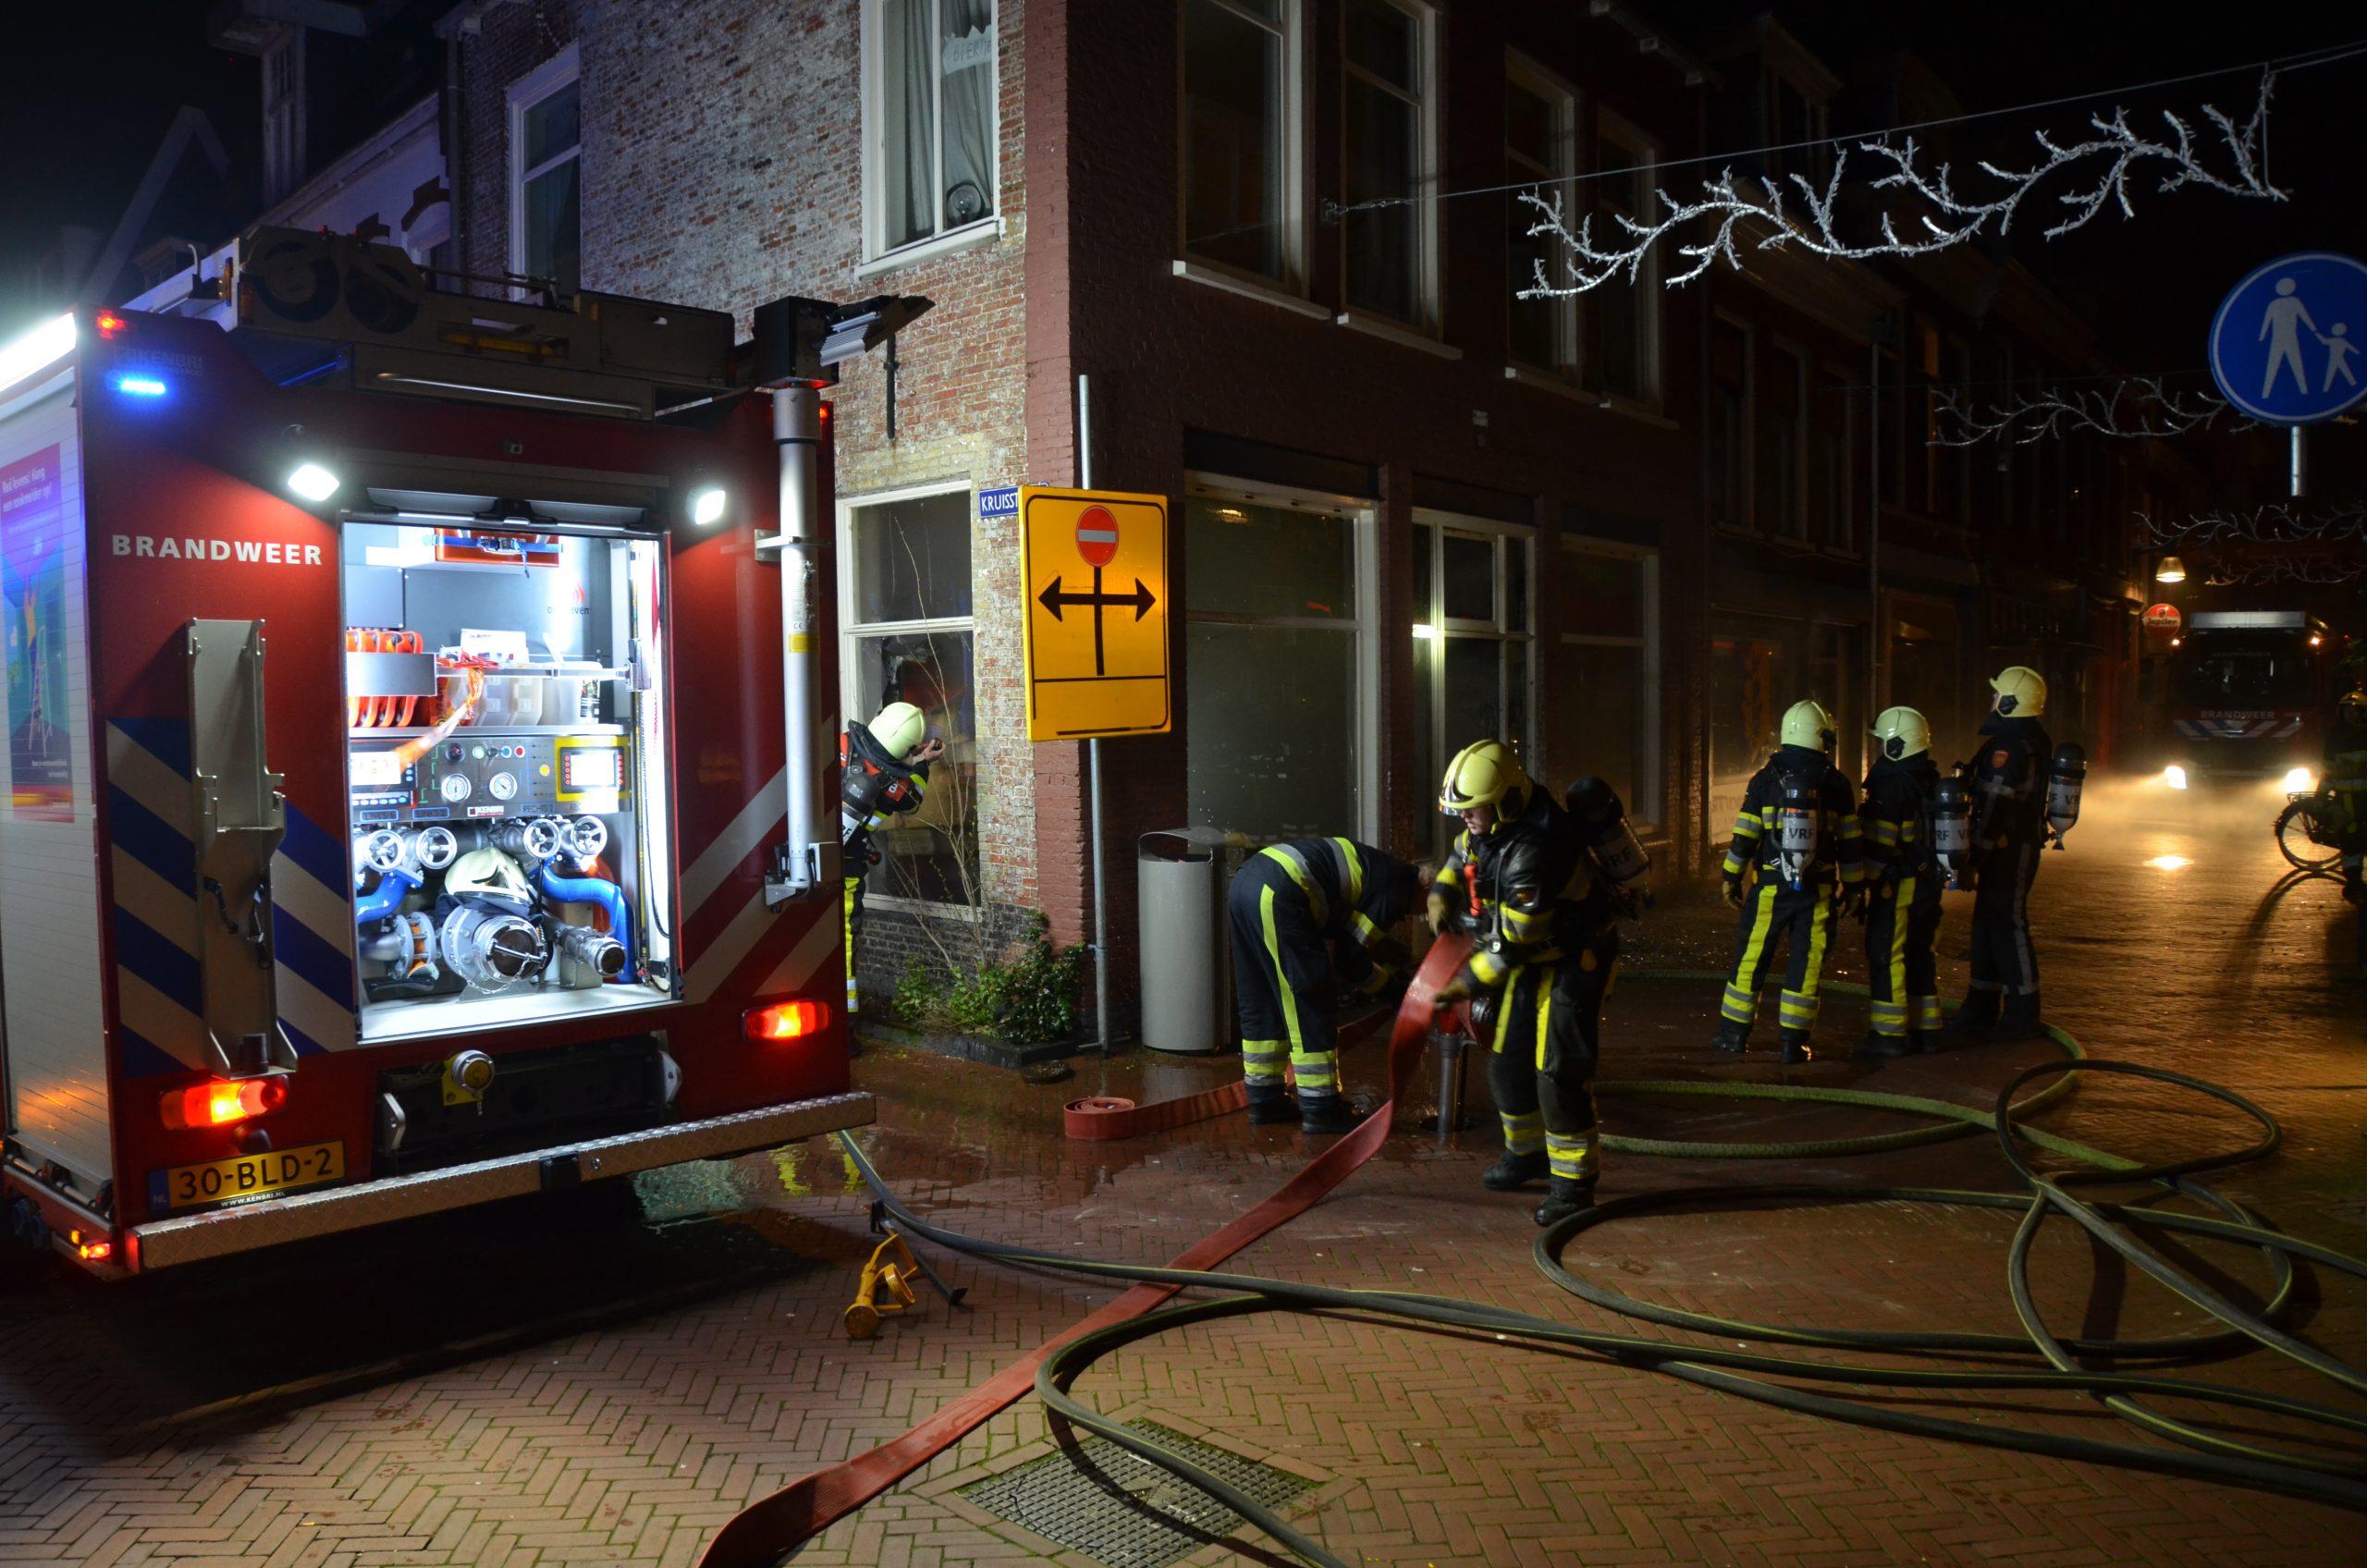 Flinke schade na brand in een Pizzeria in Leeuwarden